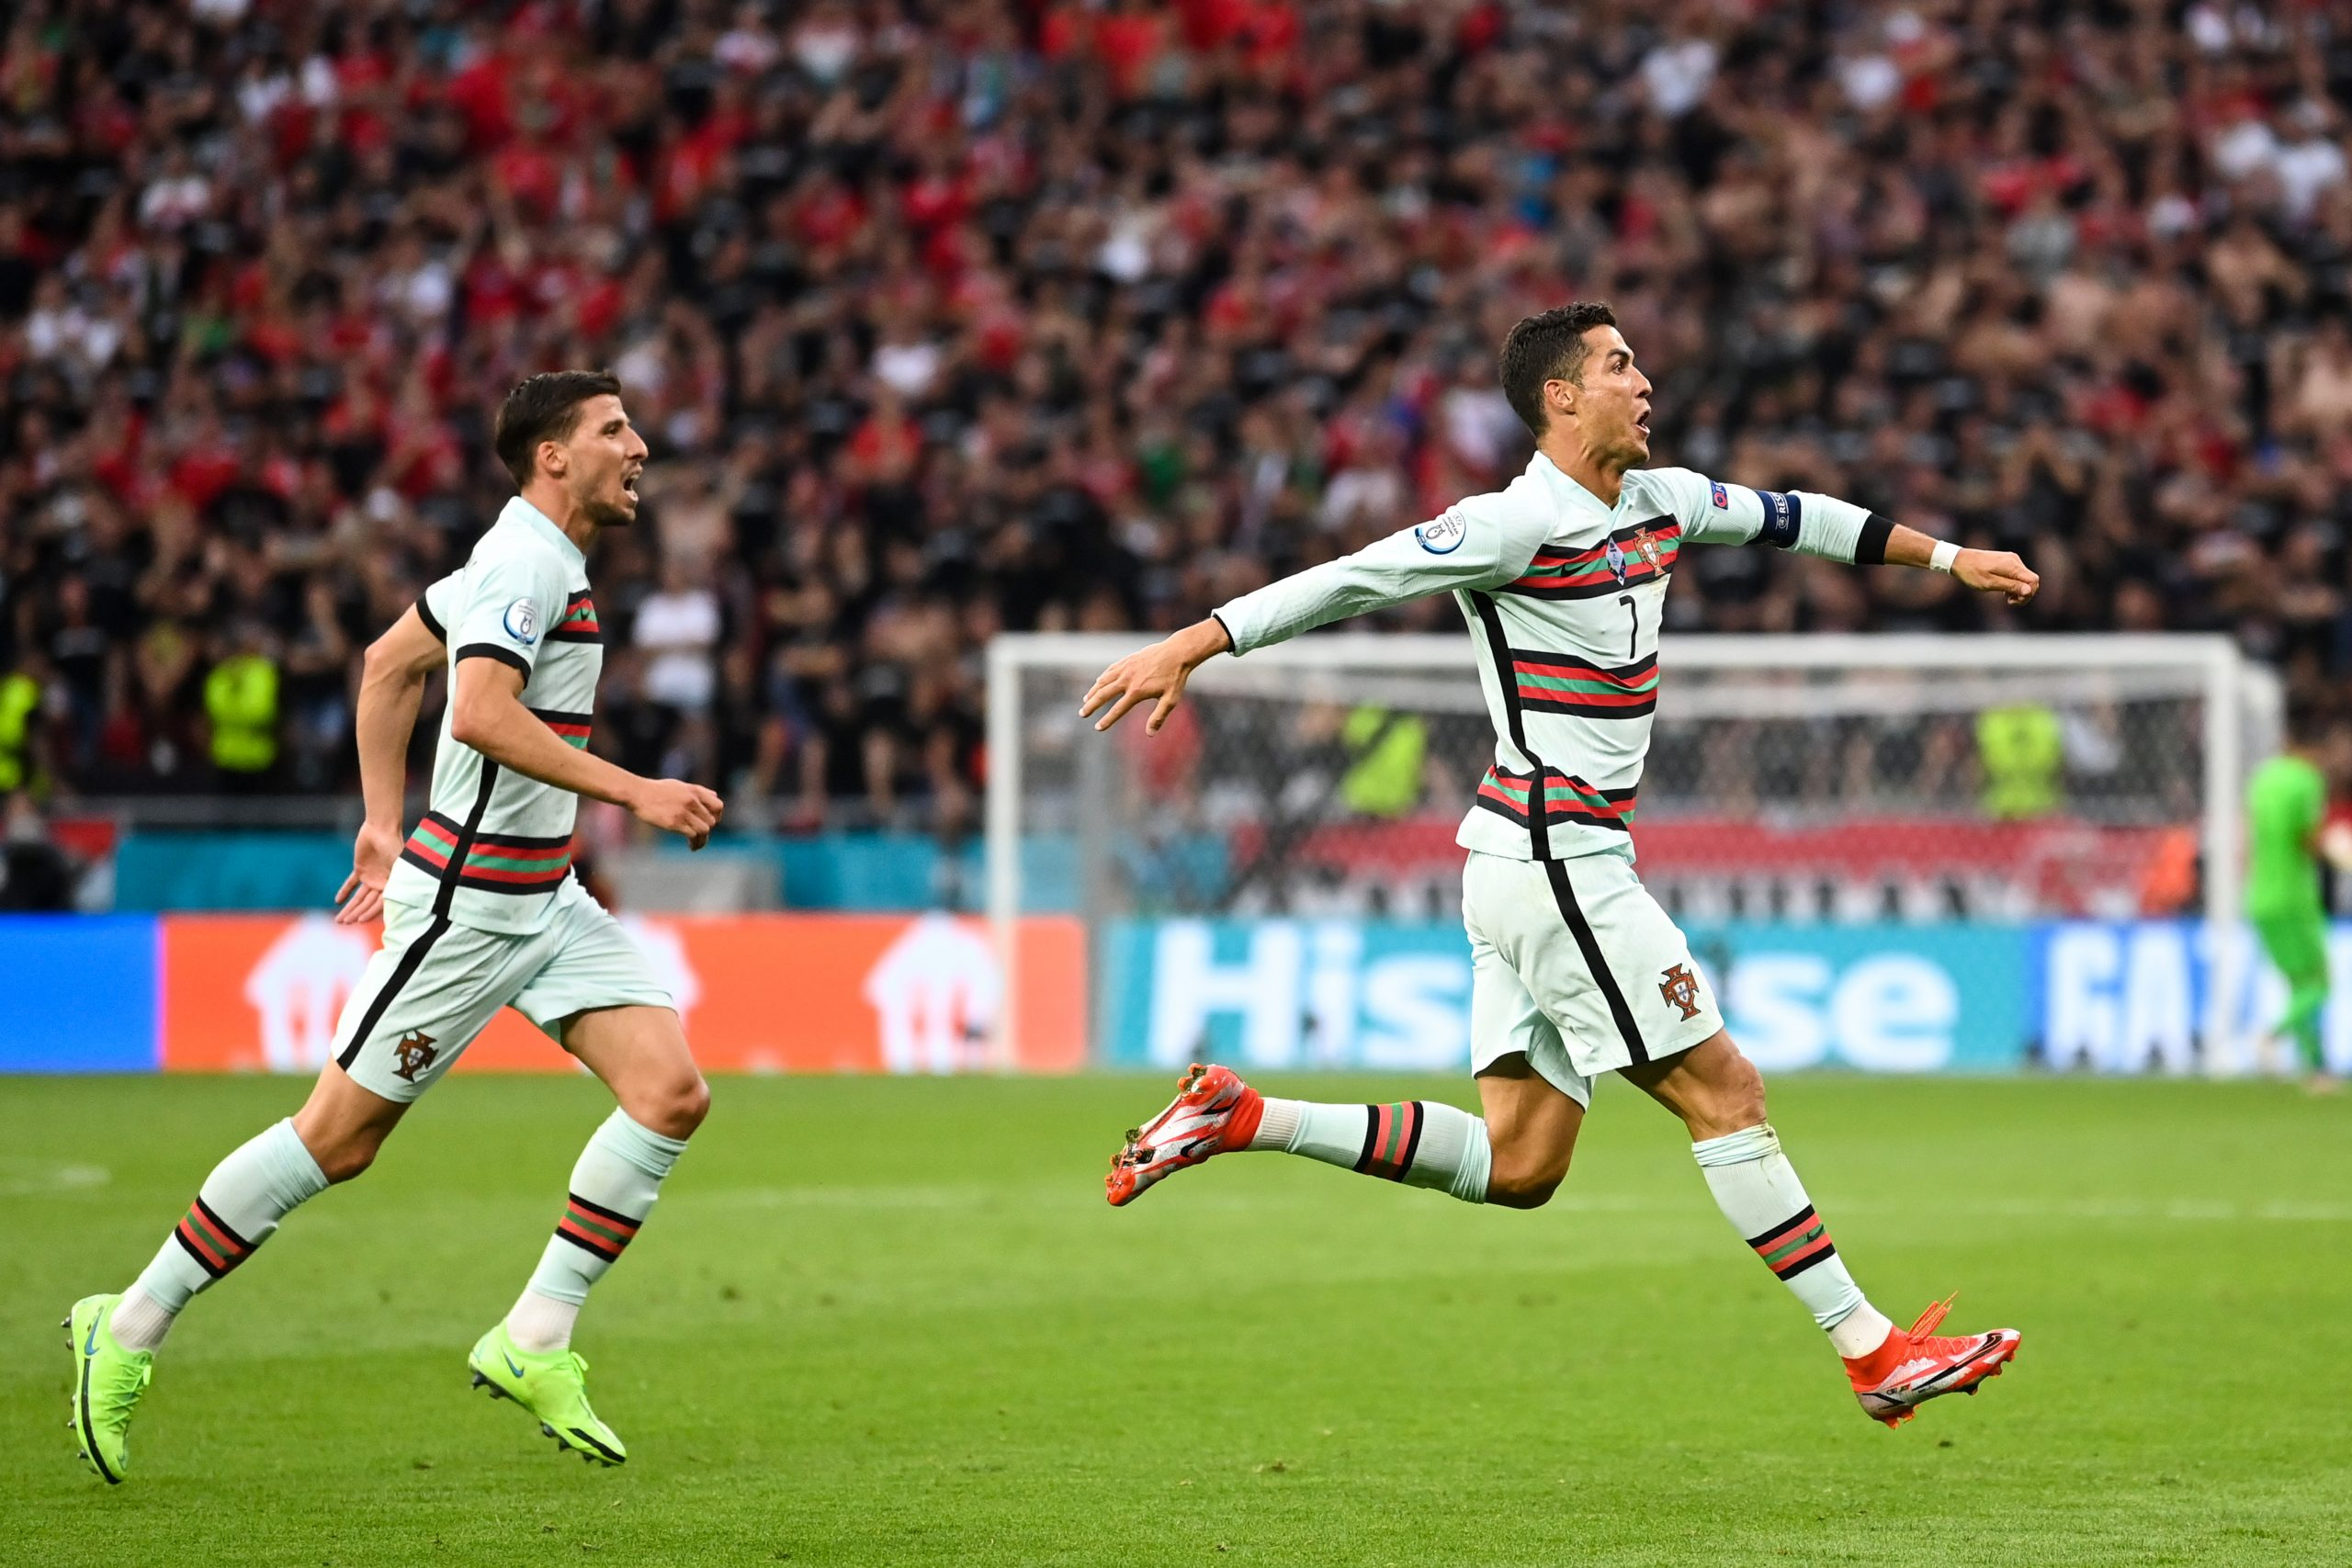 Mercato - Ronaldo devrait rester à la Juventus, confirme La Stampa